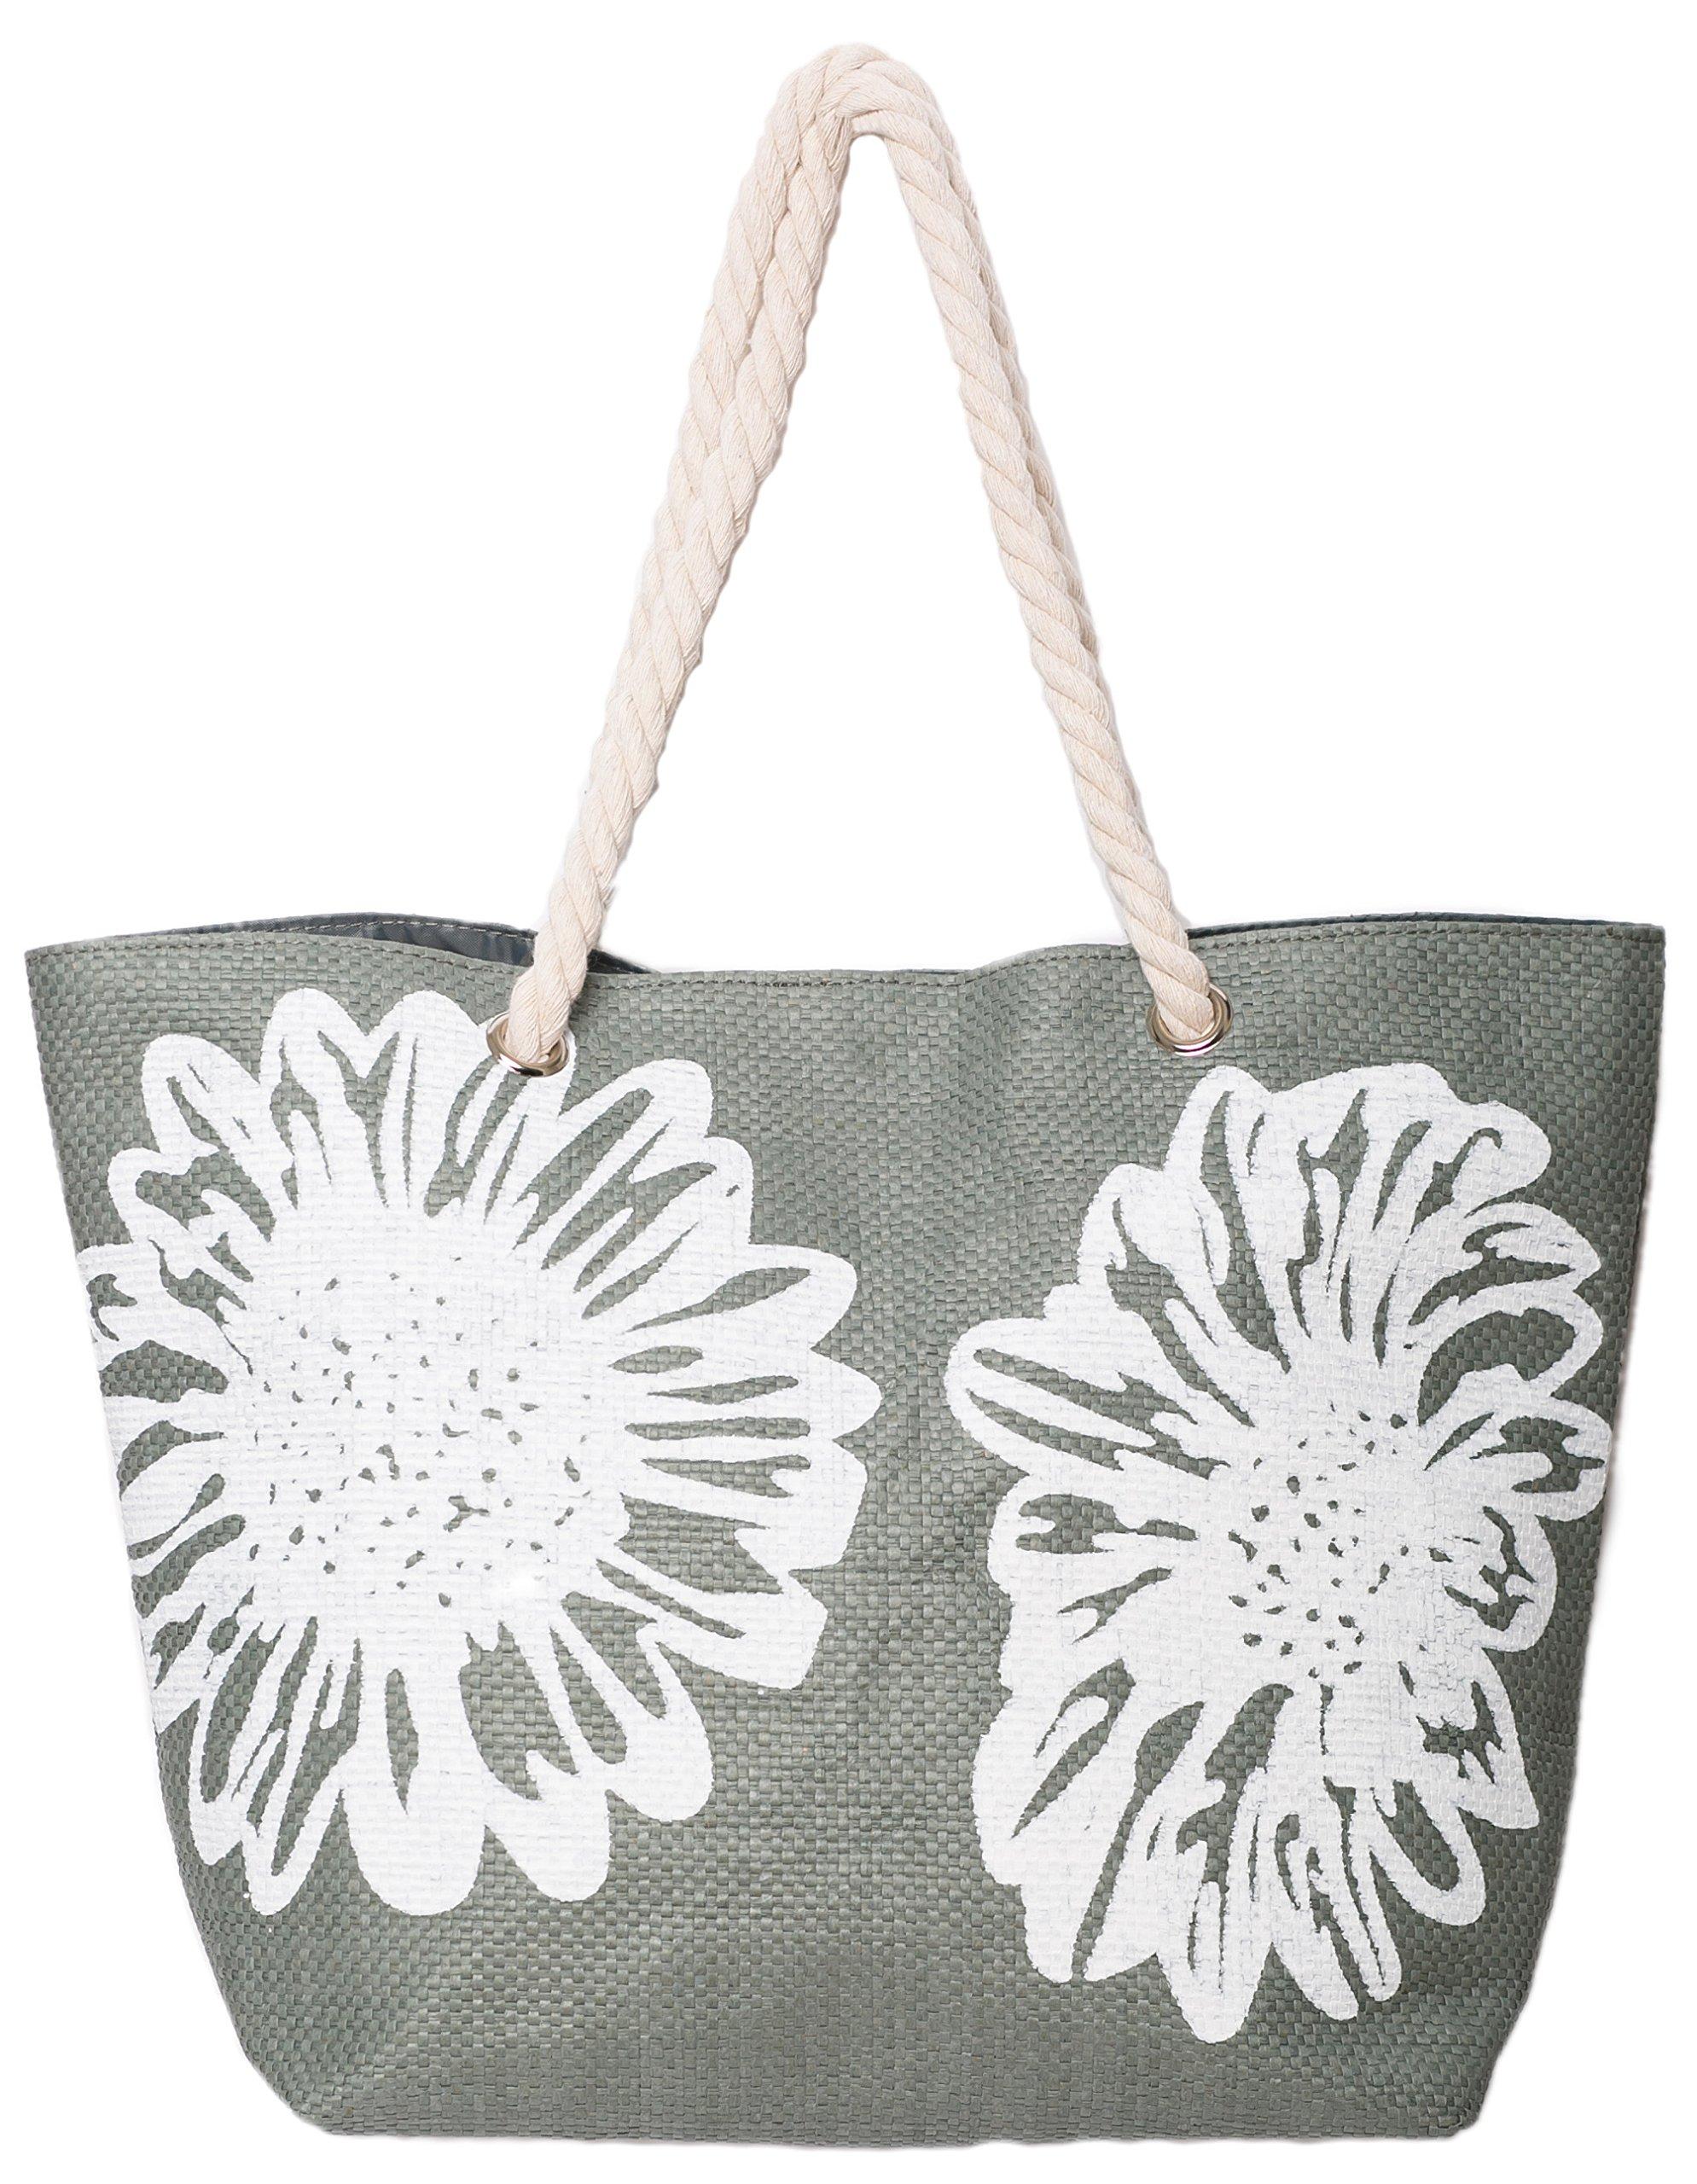 Beach Bag Tote Bags for Women Ladies Large Summer Shoulder Bag With Pocket Carrier Bag Flower (Gray)